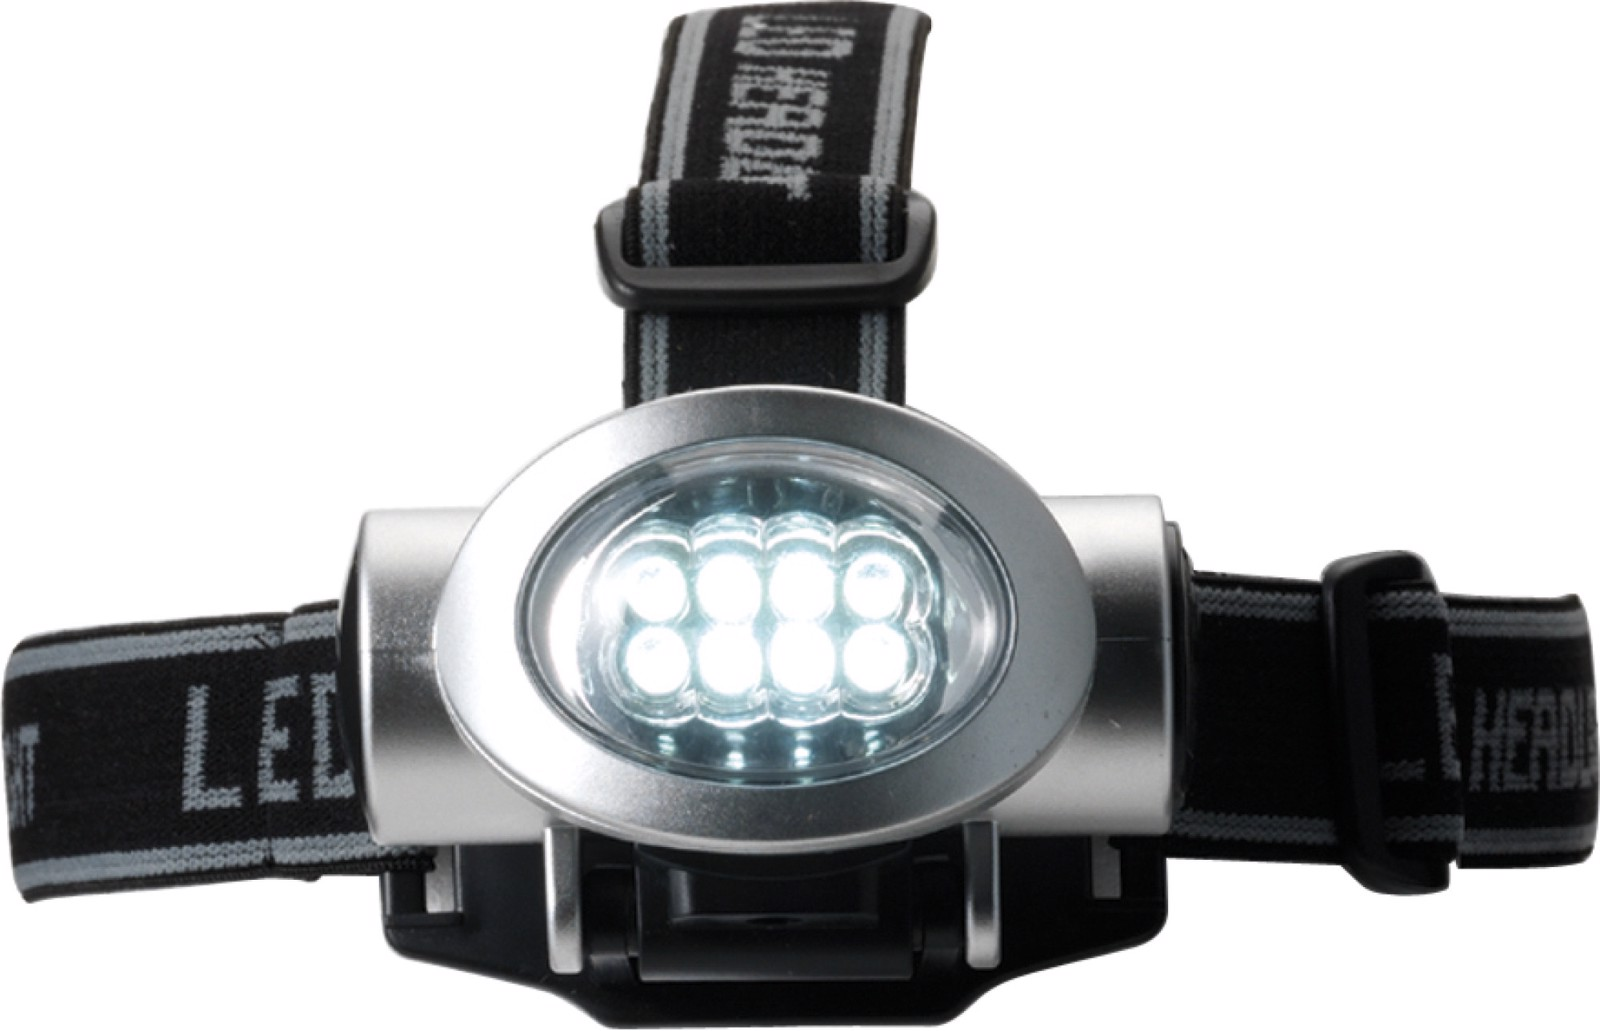 ABS head light